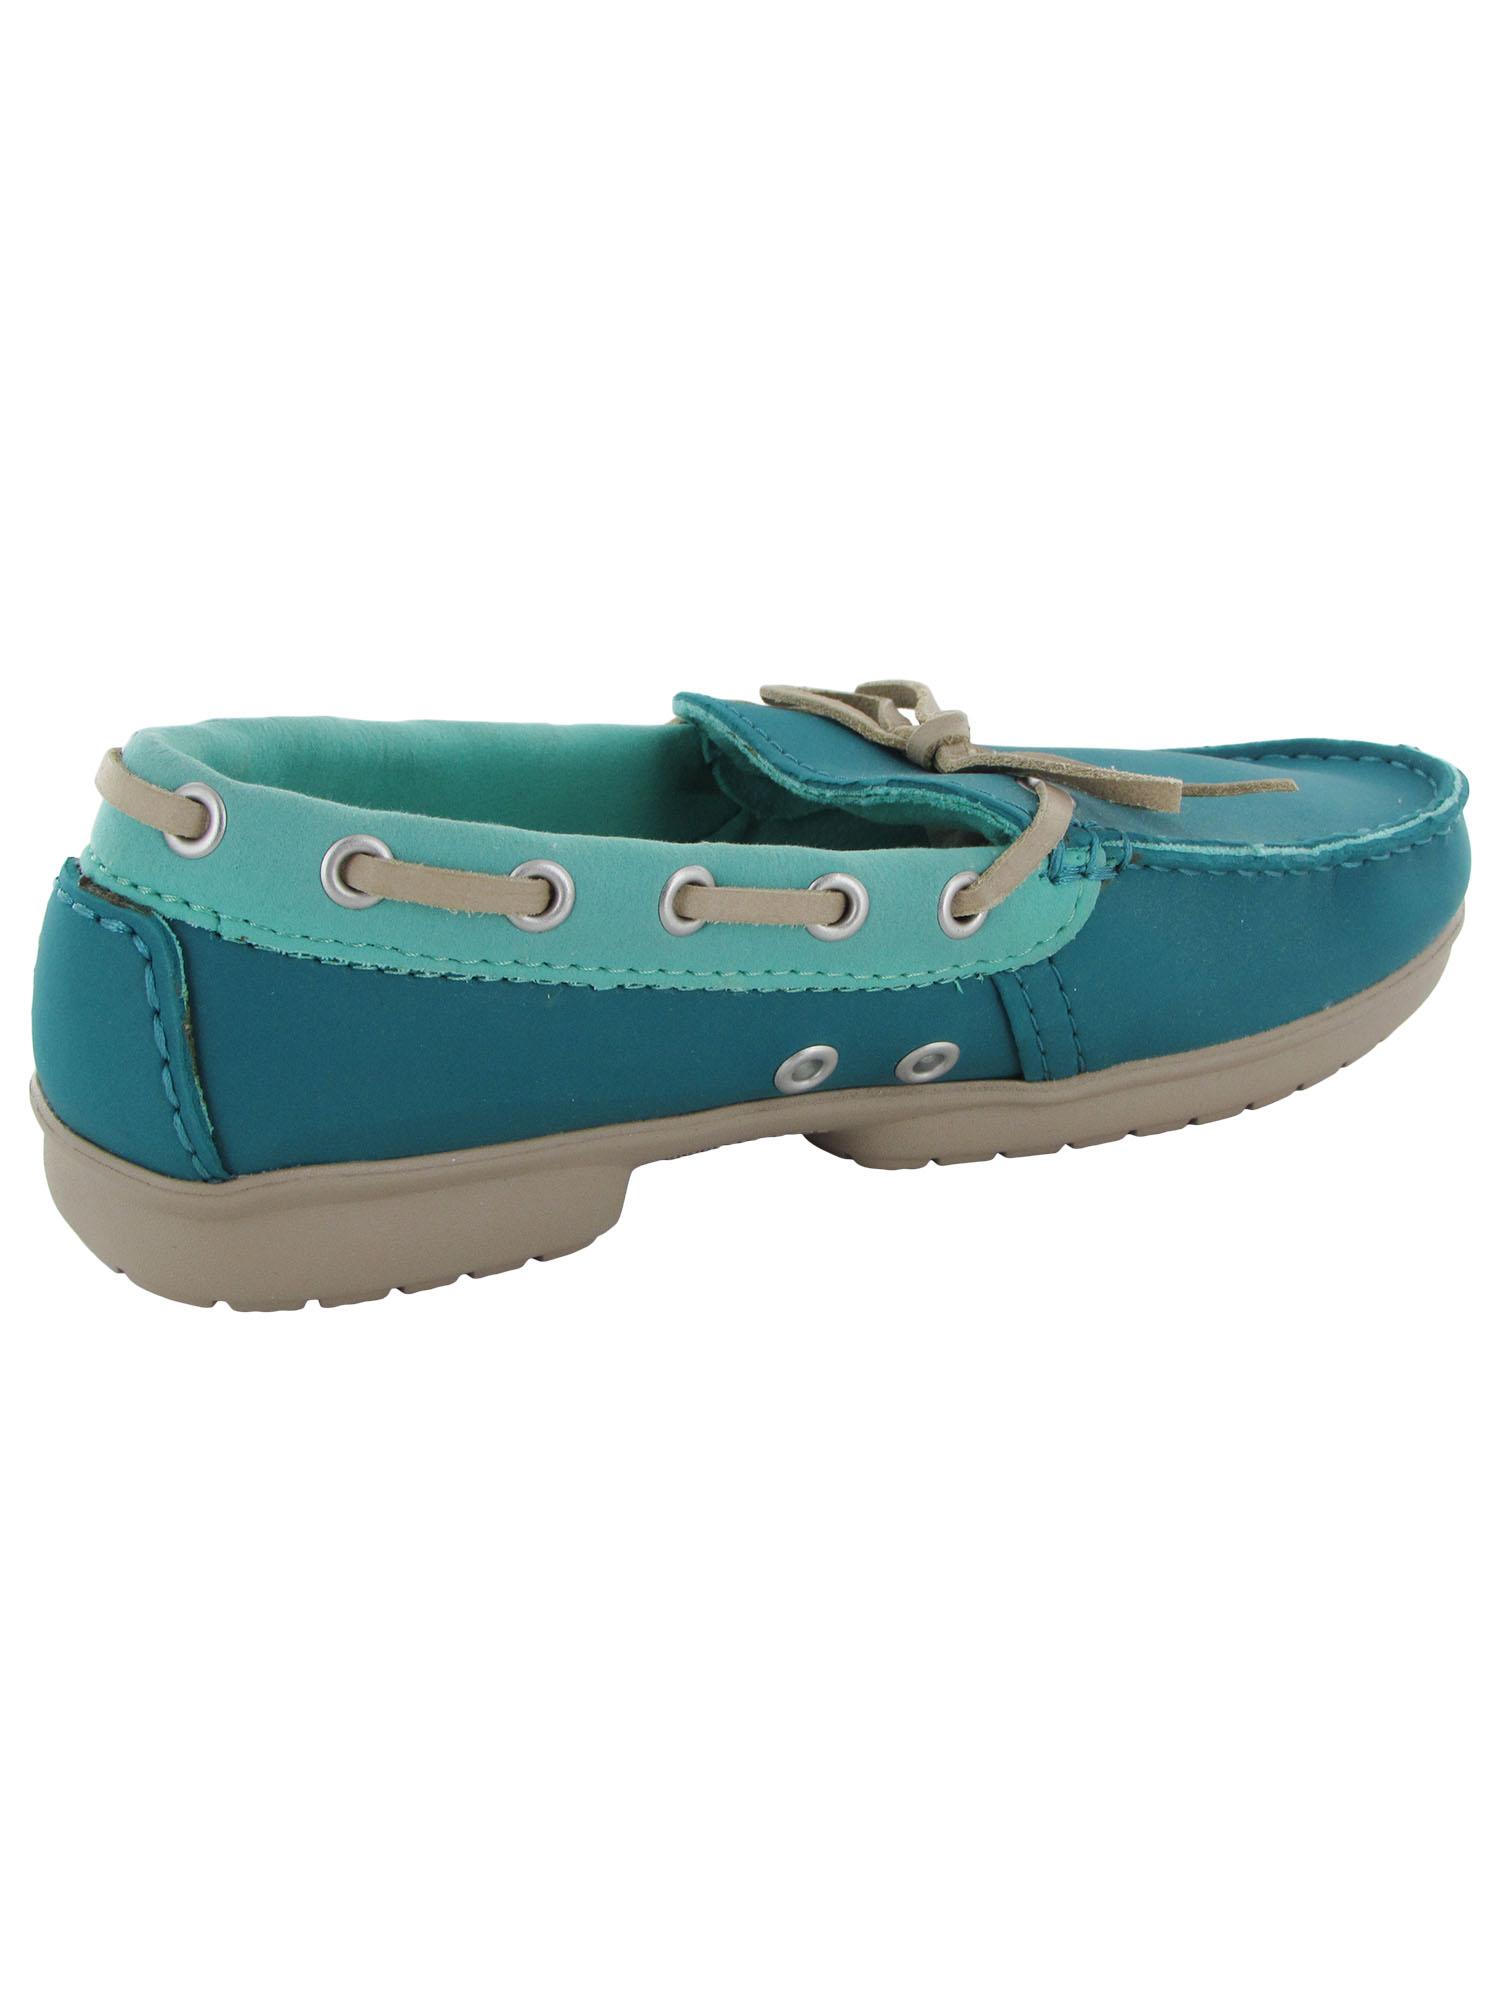 Crocs-Womens-Wrap-ColorLite-Loafer-Shoes thumbnail 7